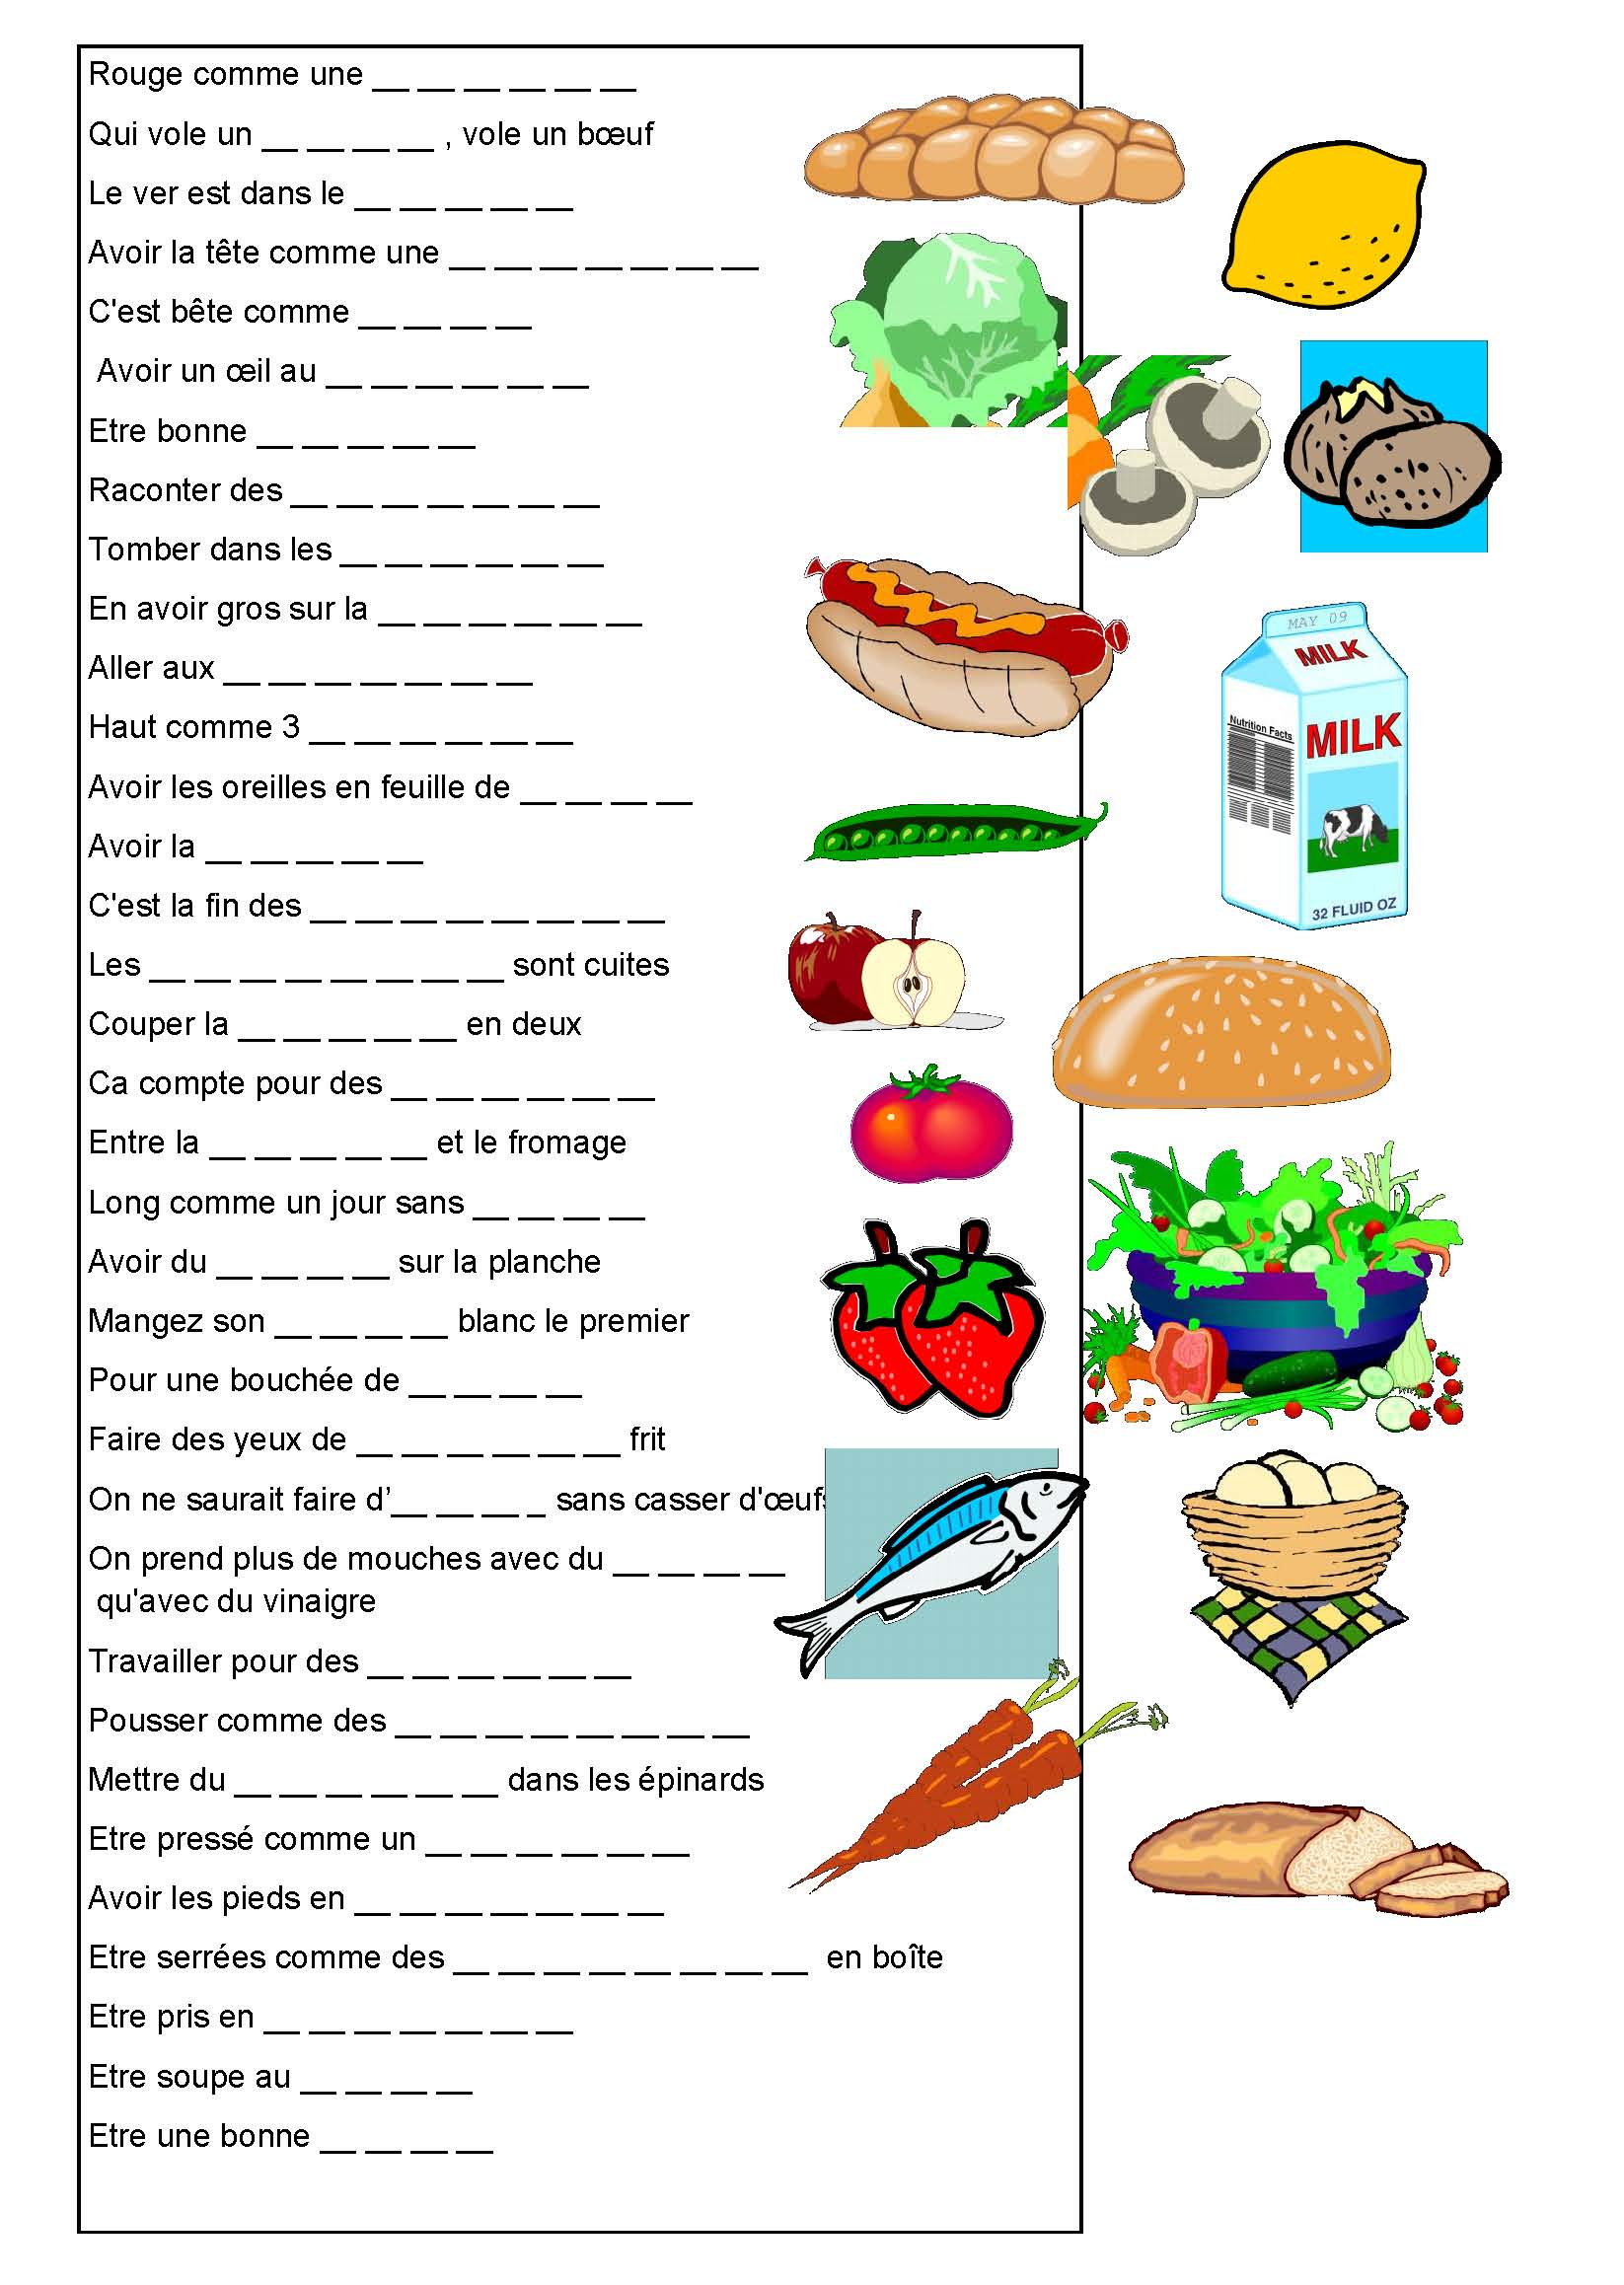 Les expressions avec les fruits, les légumes, les aliments...